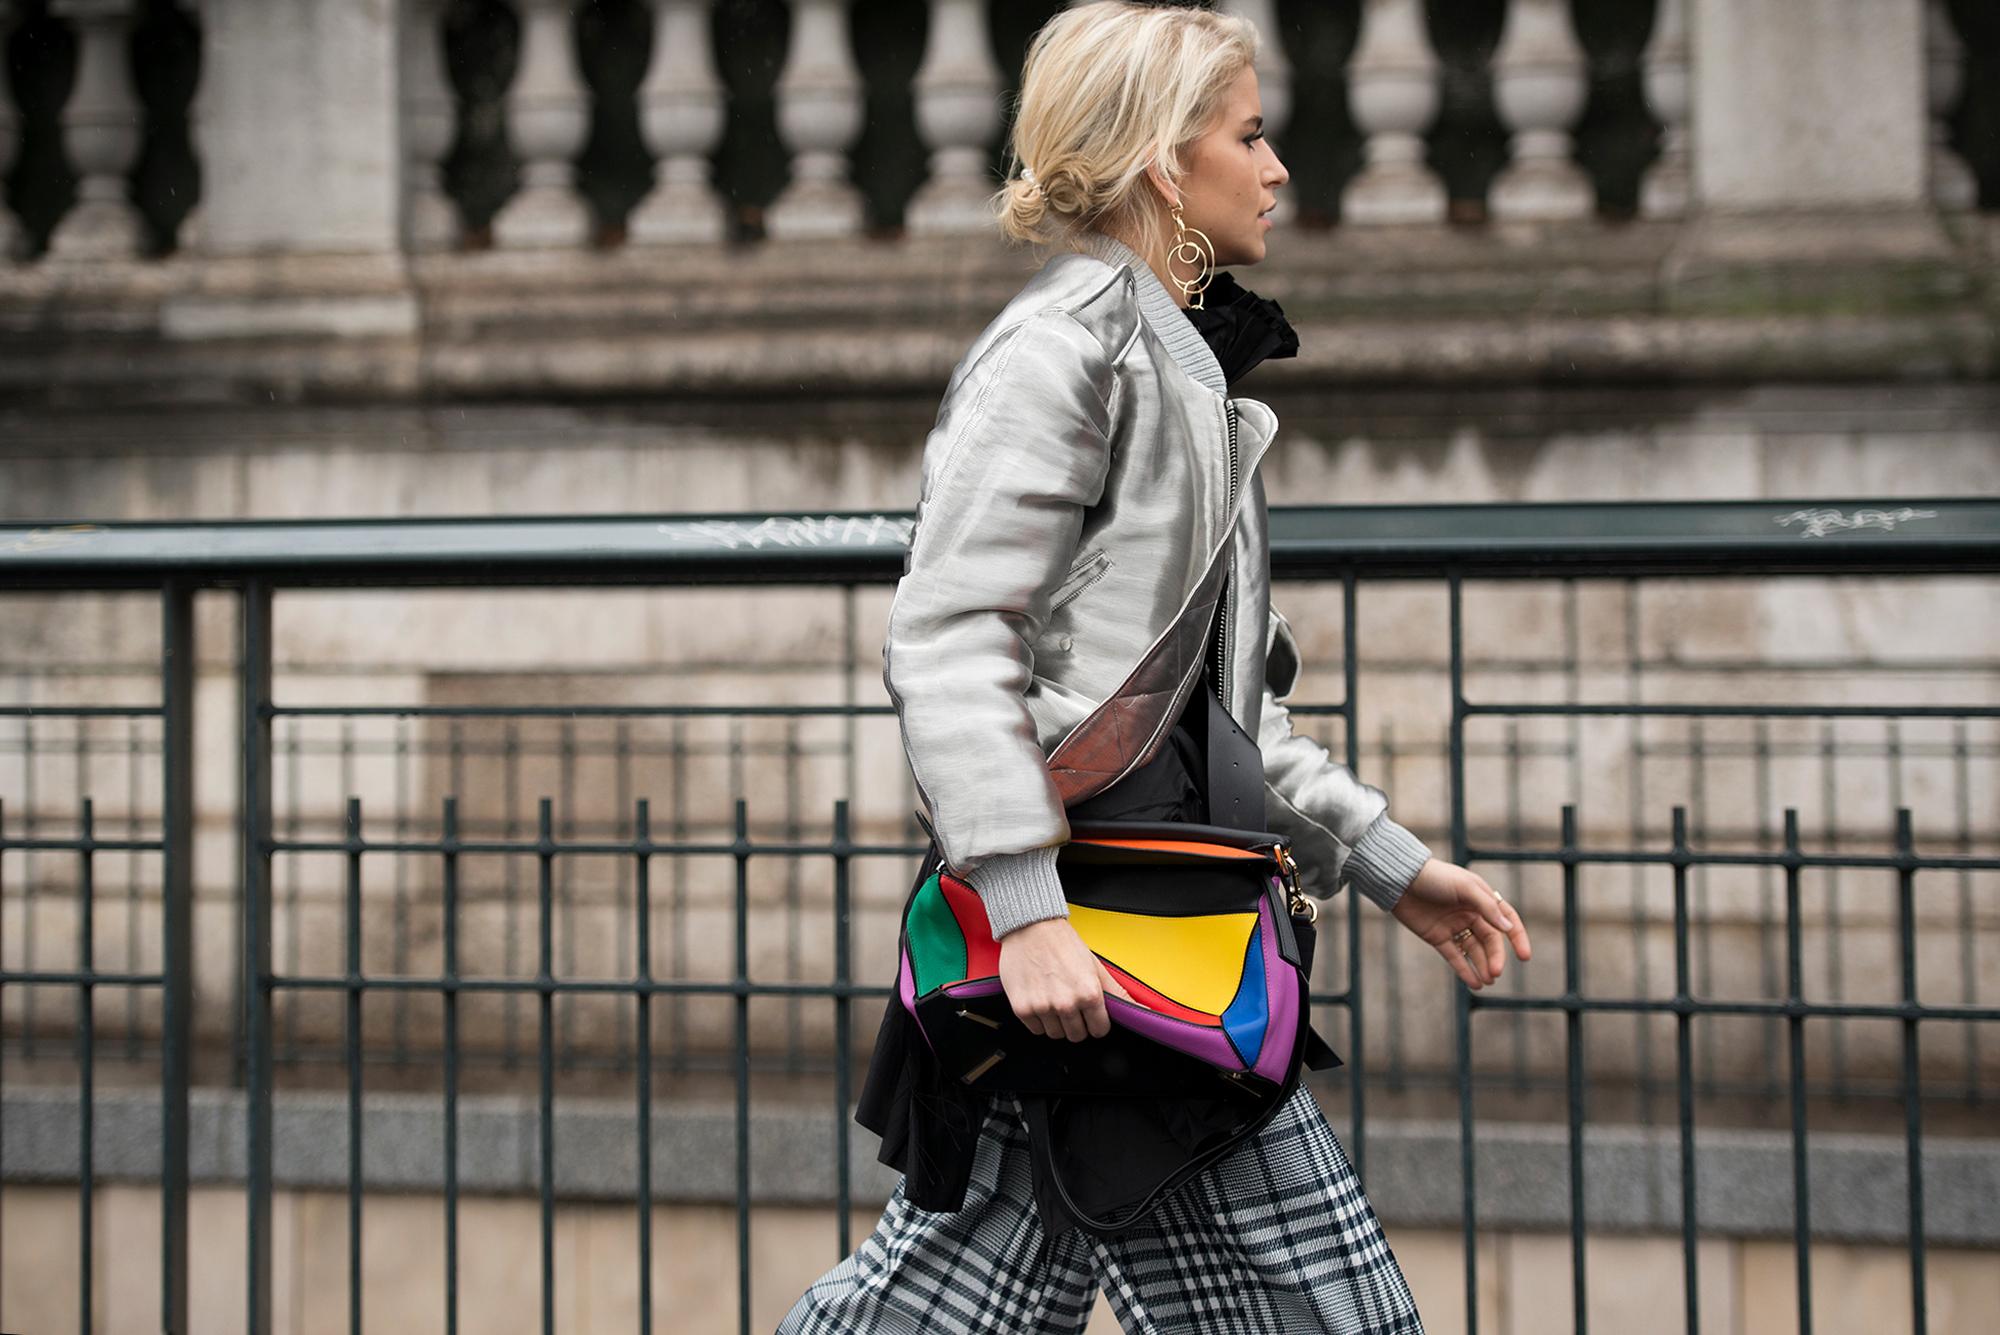 Streetsnaps Paris Fashion Week March 2017 Part 1 Hypebeast - 3744010